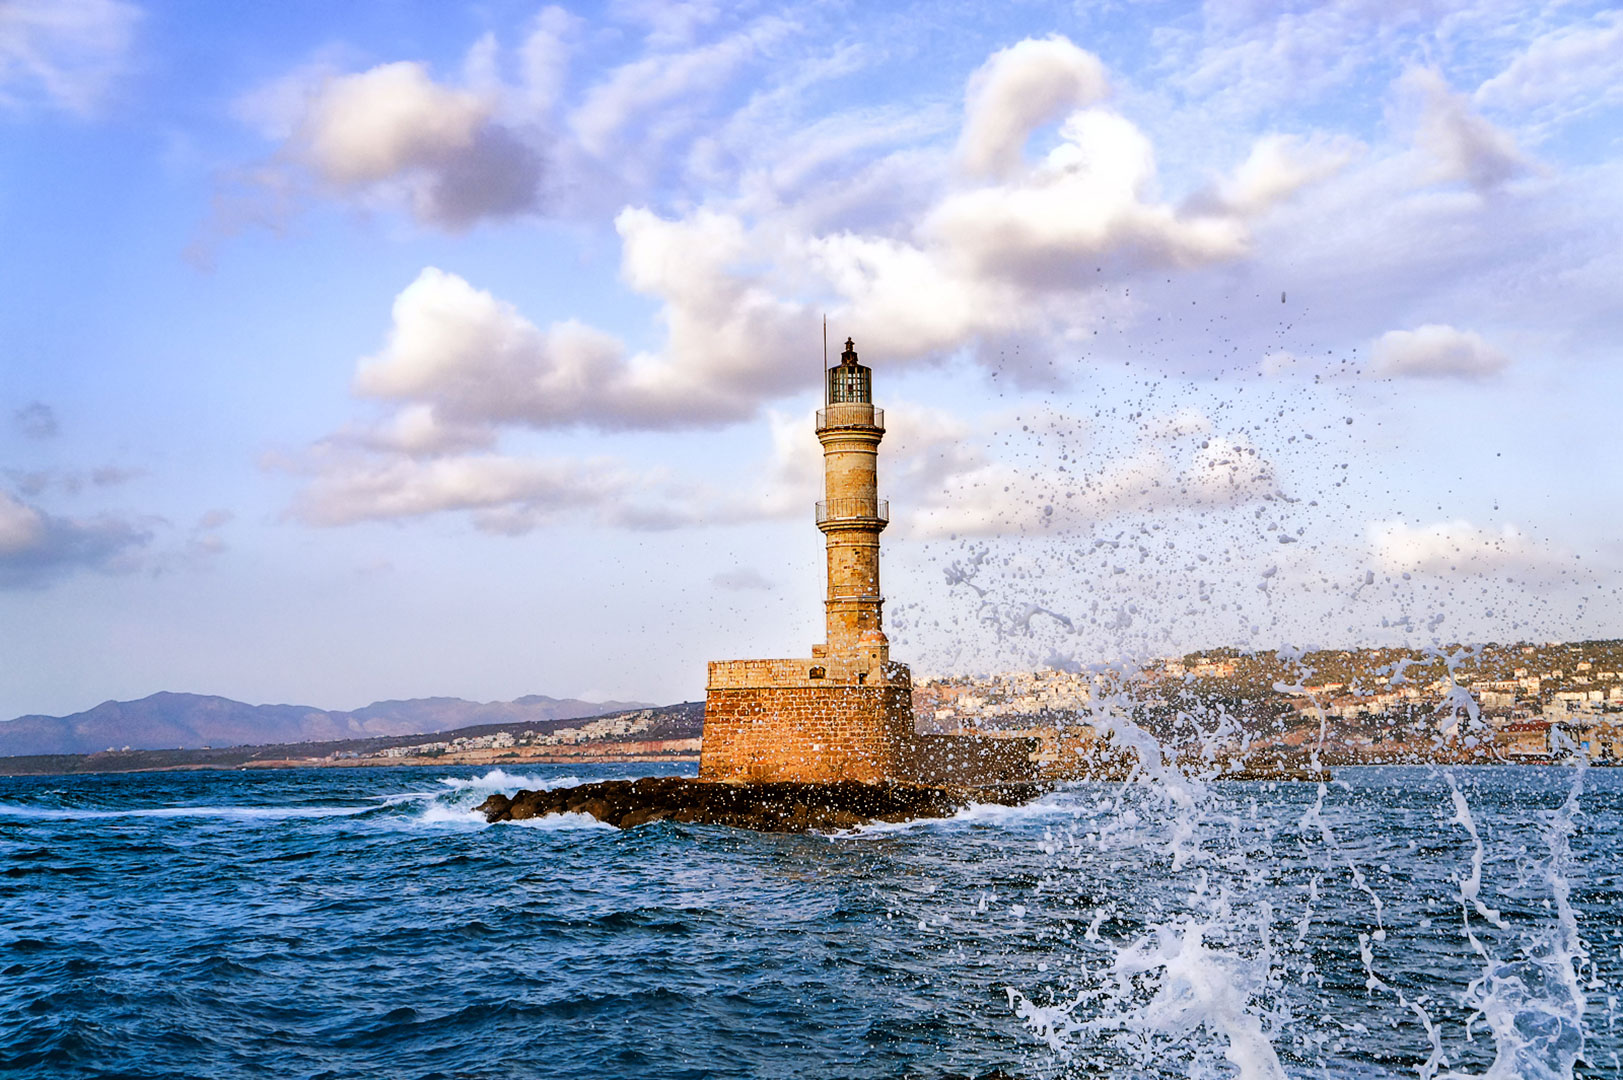 chania-crete-greece-la-vie-en-blog-all-rights-reserved-10